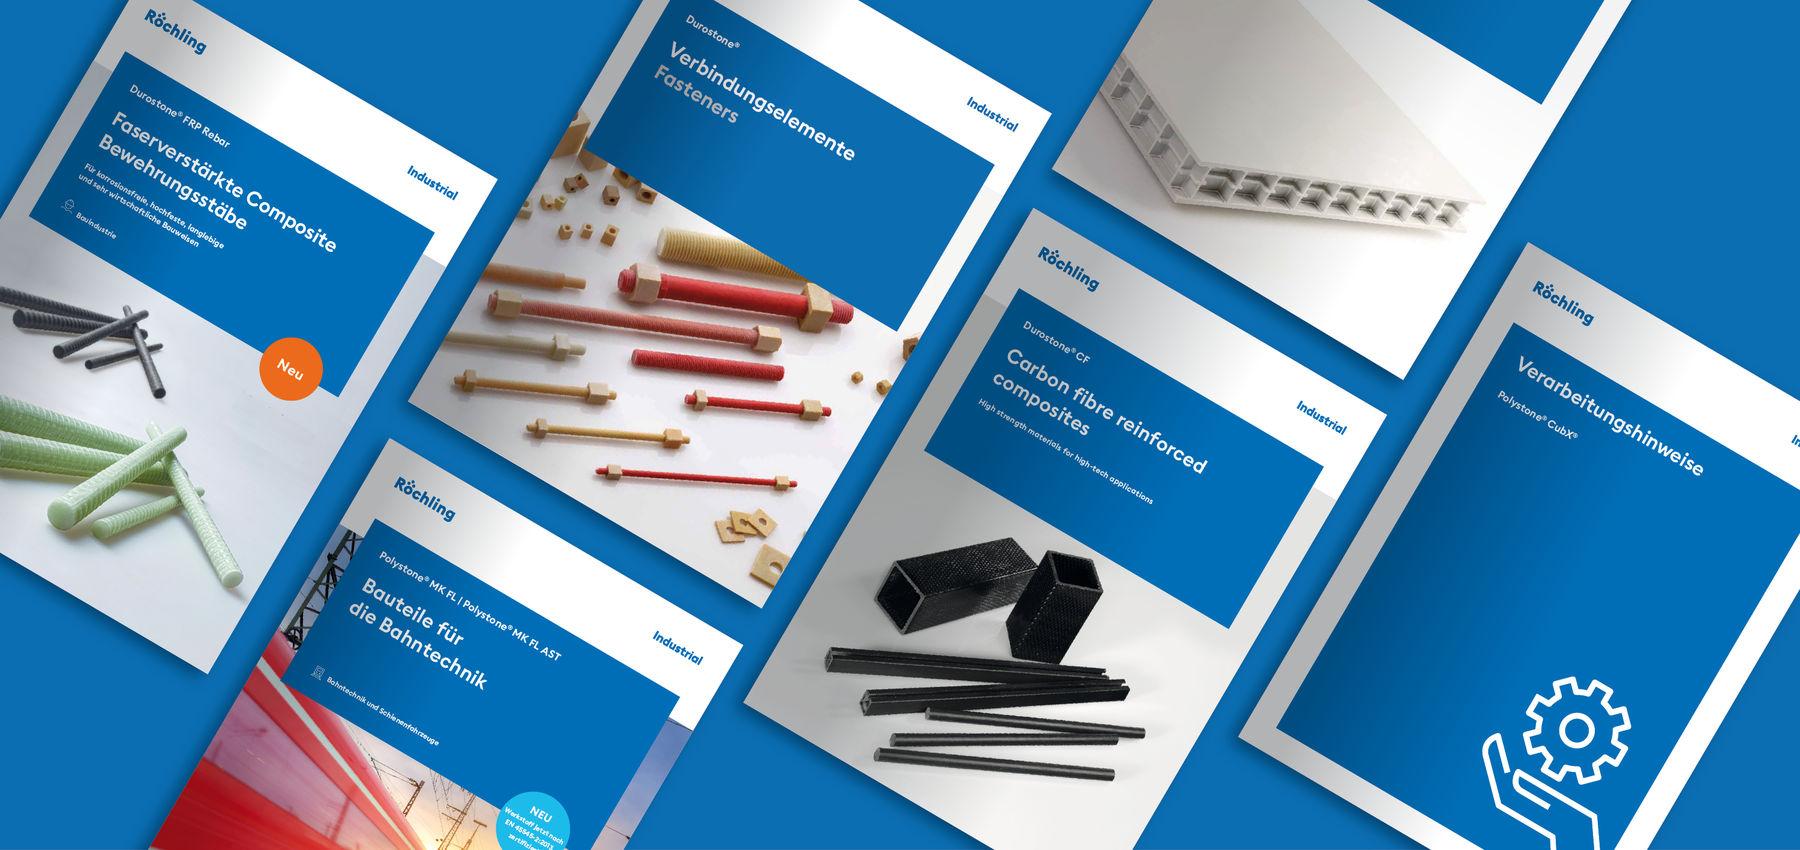 Röchling Engineering Plastics SE & Co. KG in Haren: Printsachen